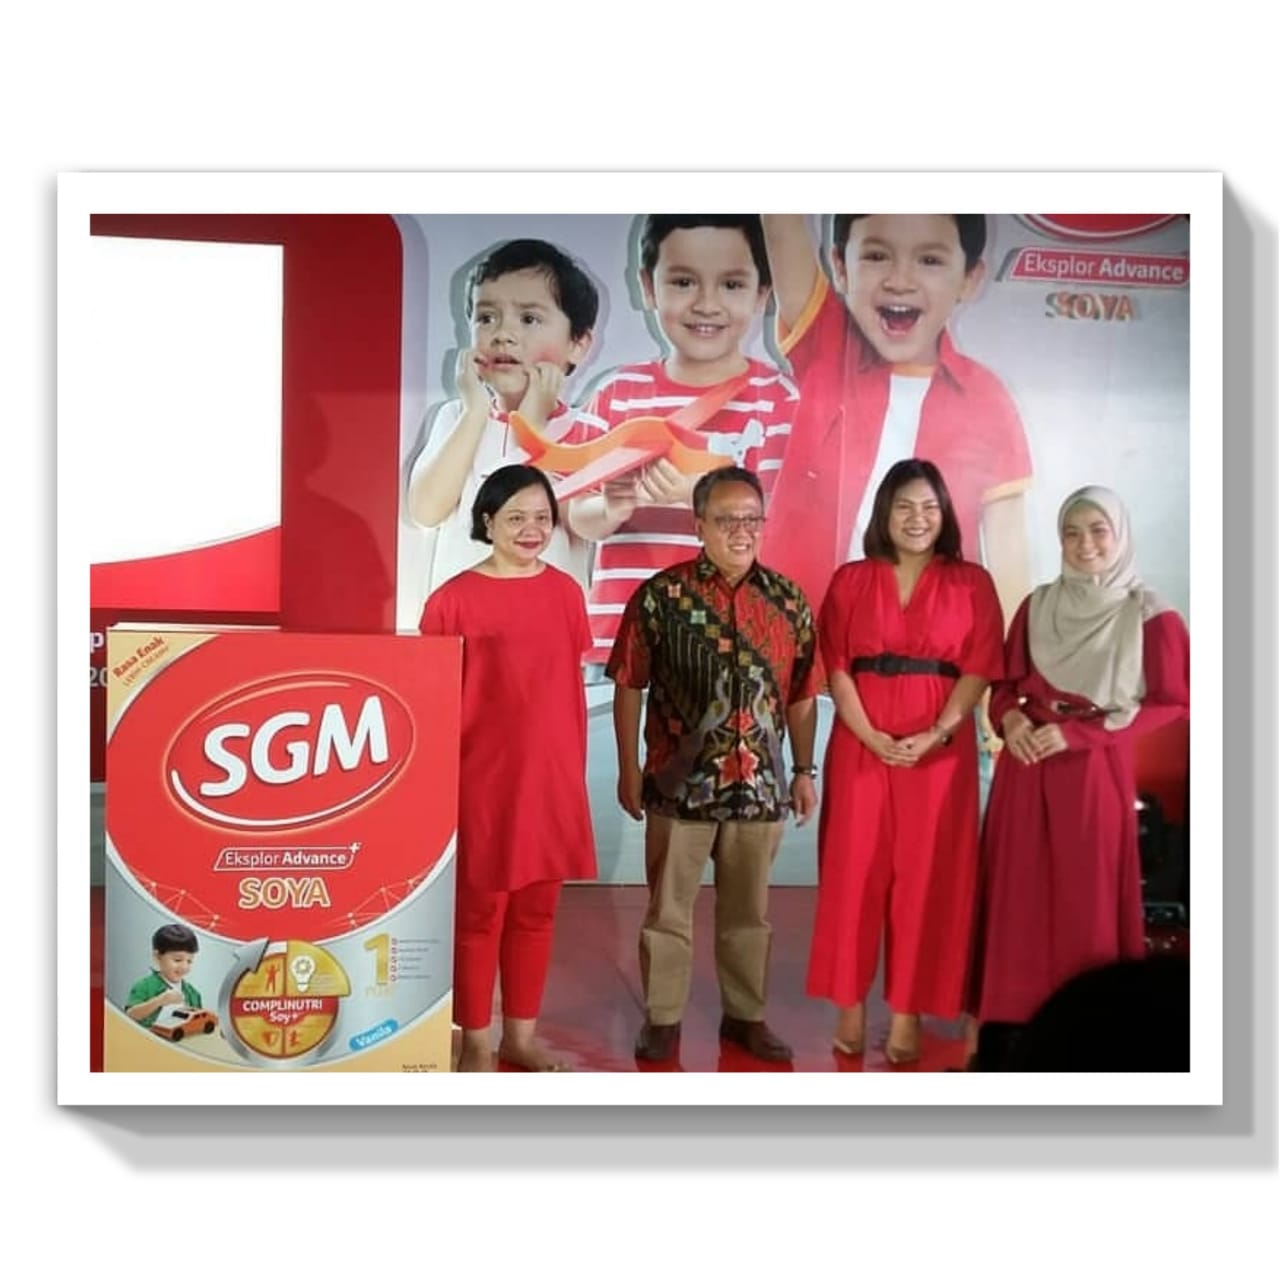 Peluncuran SGM Eksplor Advance+Soya